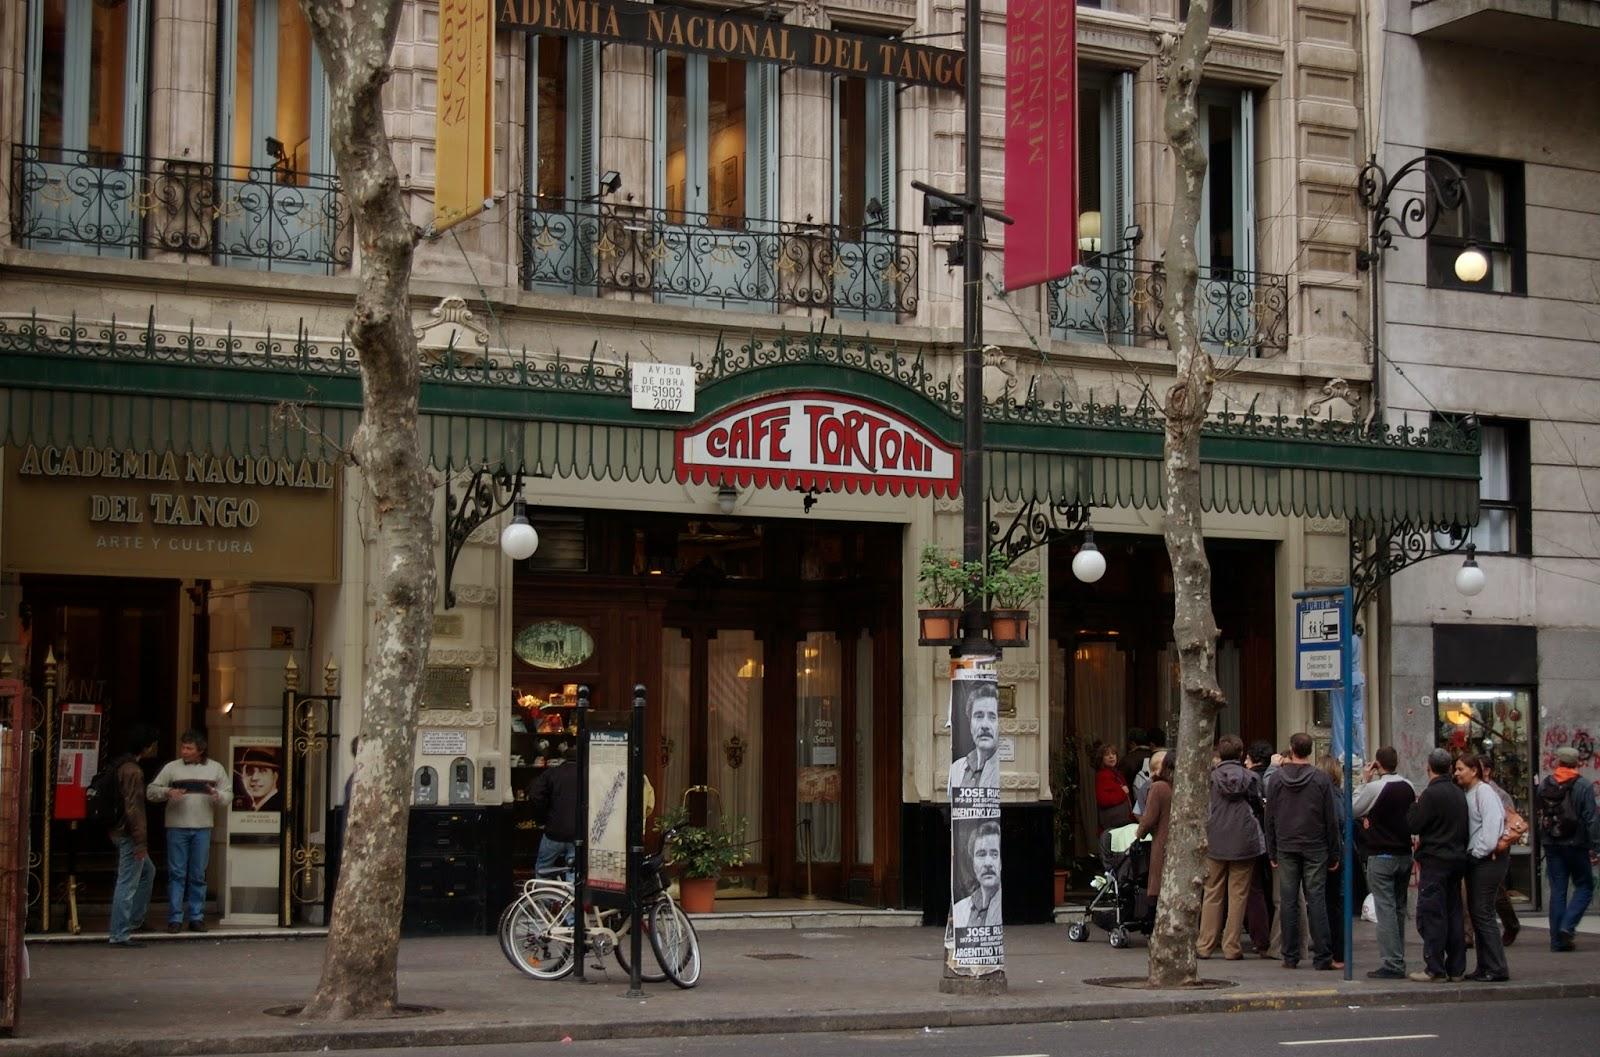 San Carlos Cafe